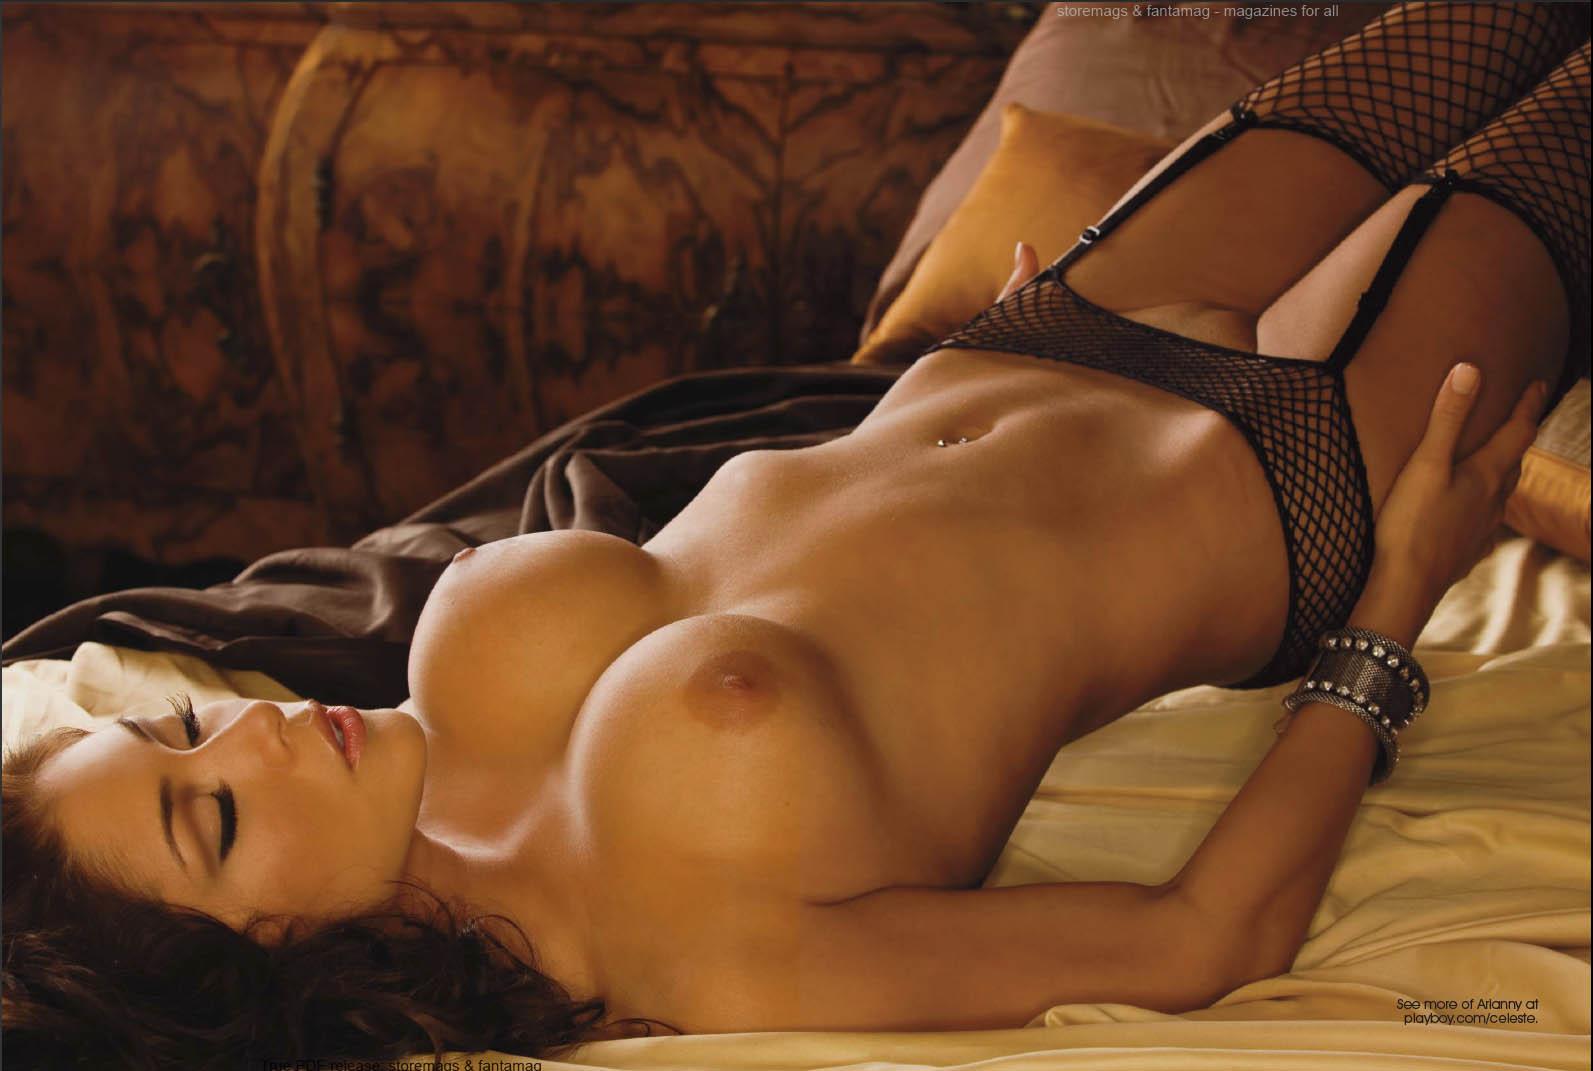 arianny celeste sexy playboy naked pics 03